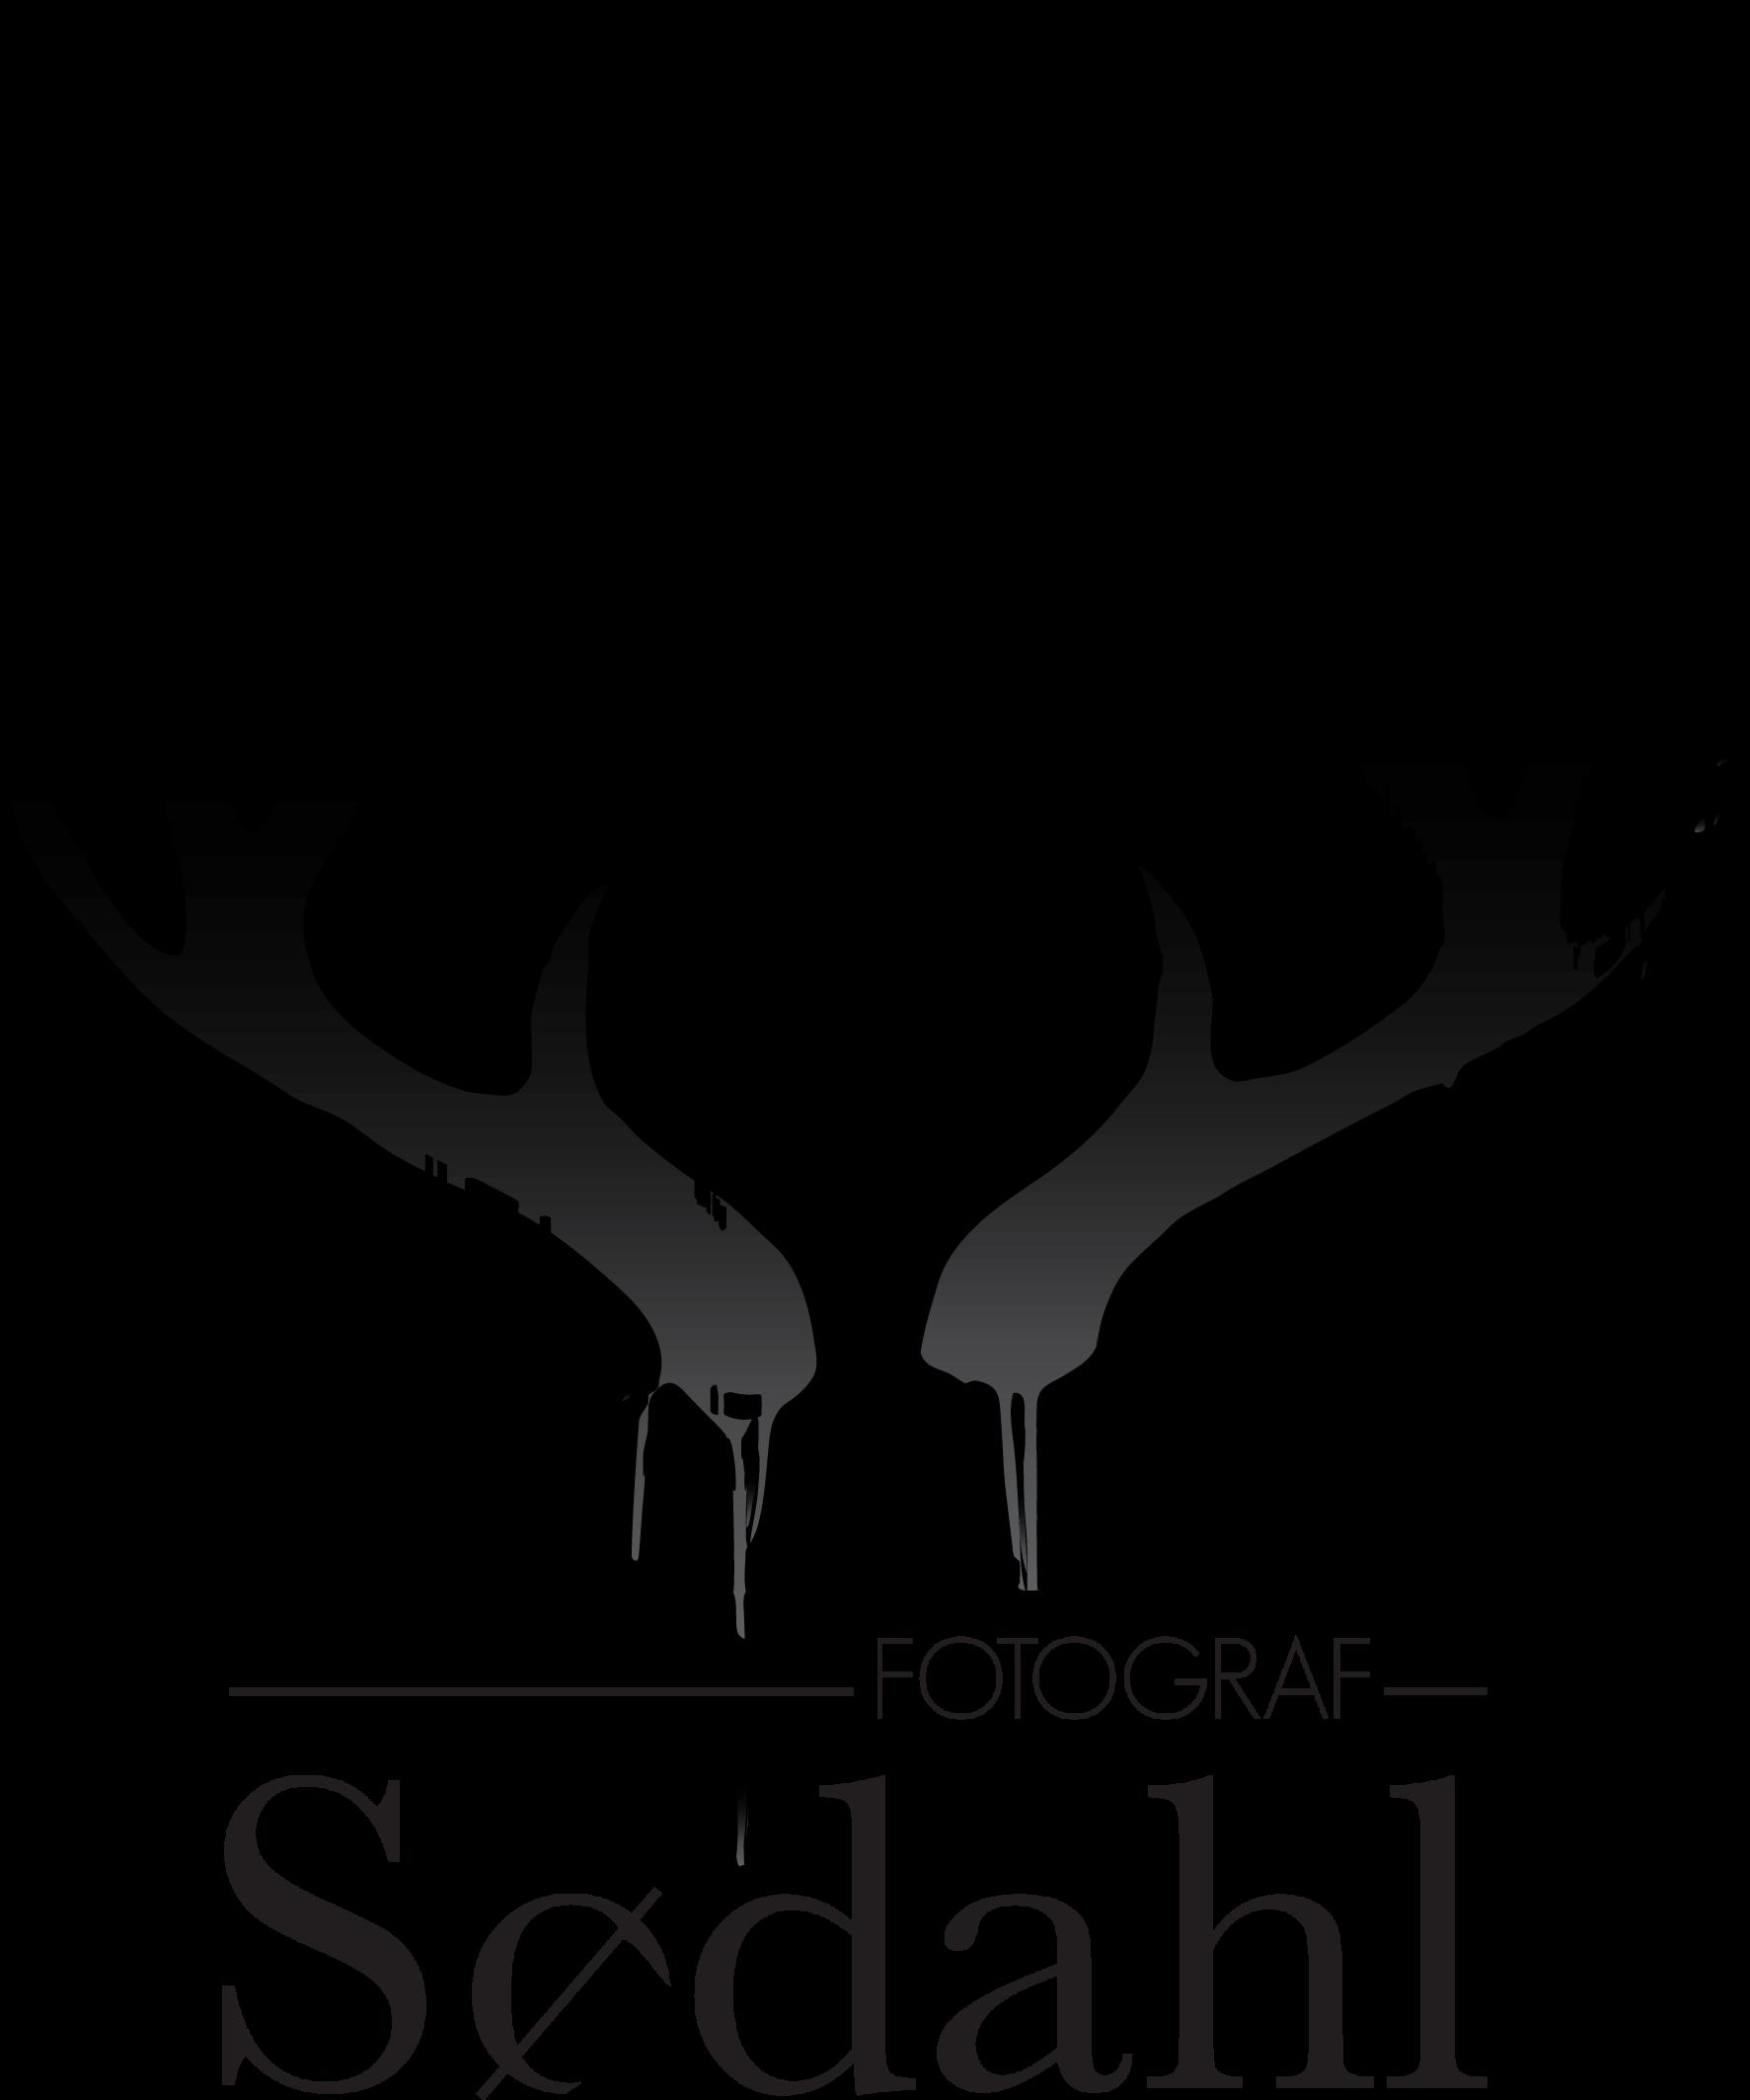 fotograf sødahl siri logo